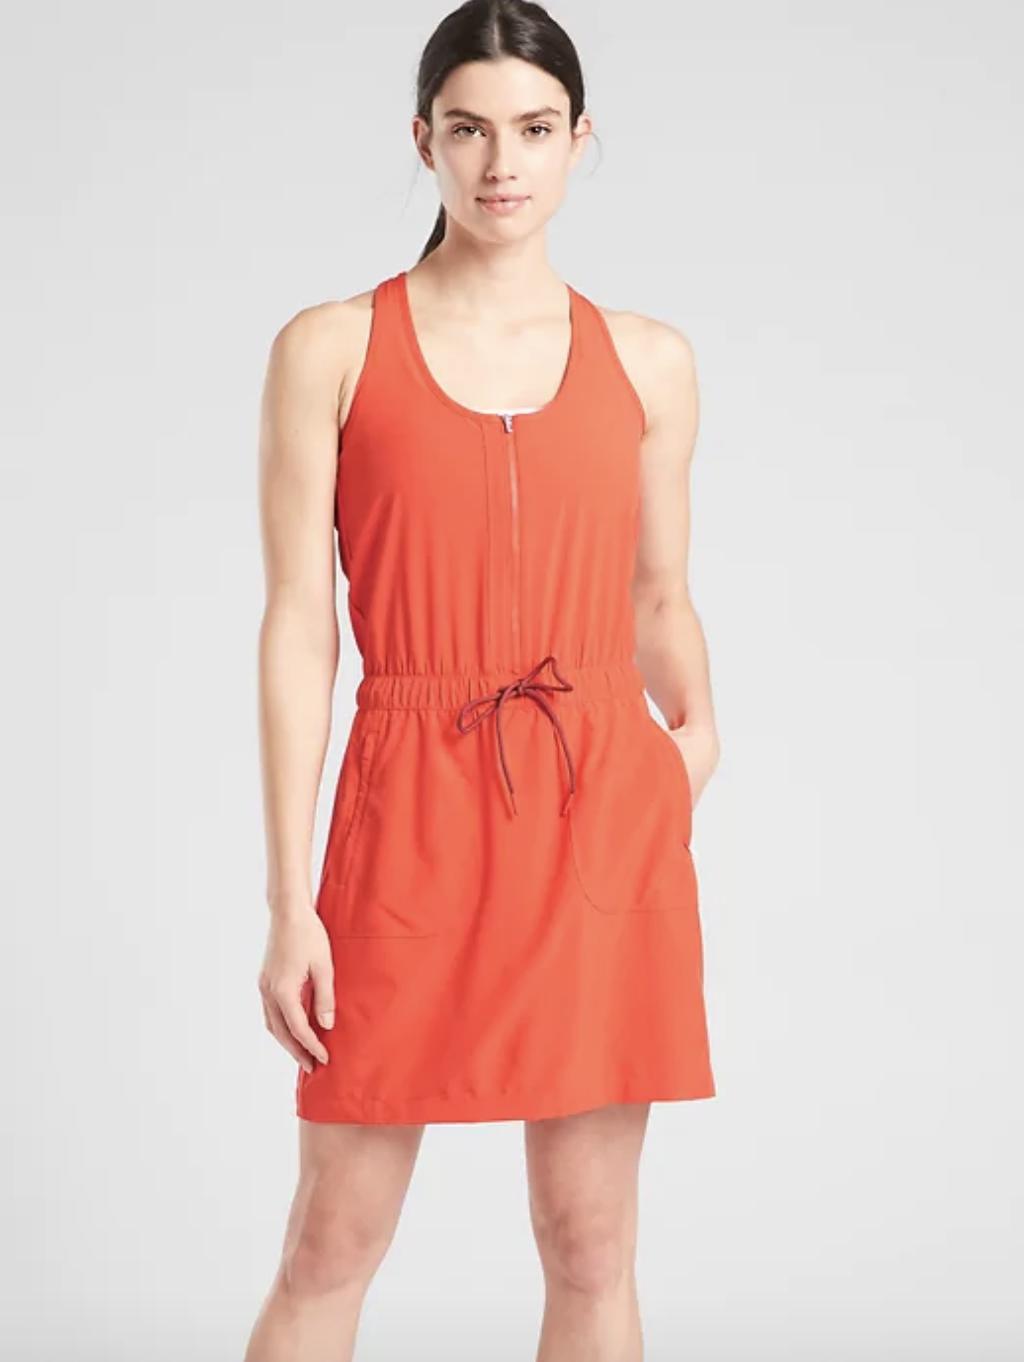 athleta-dress.png